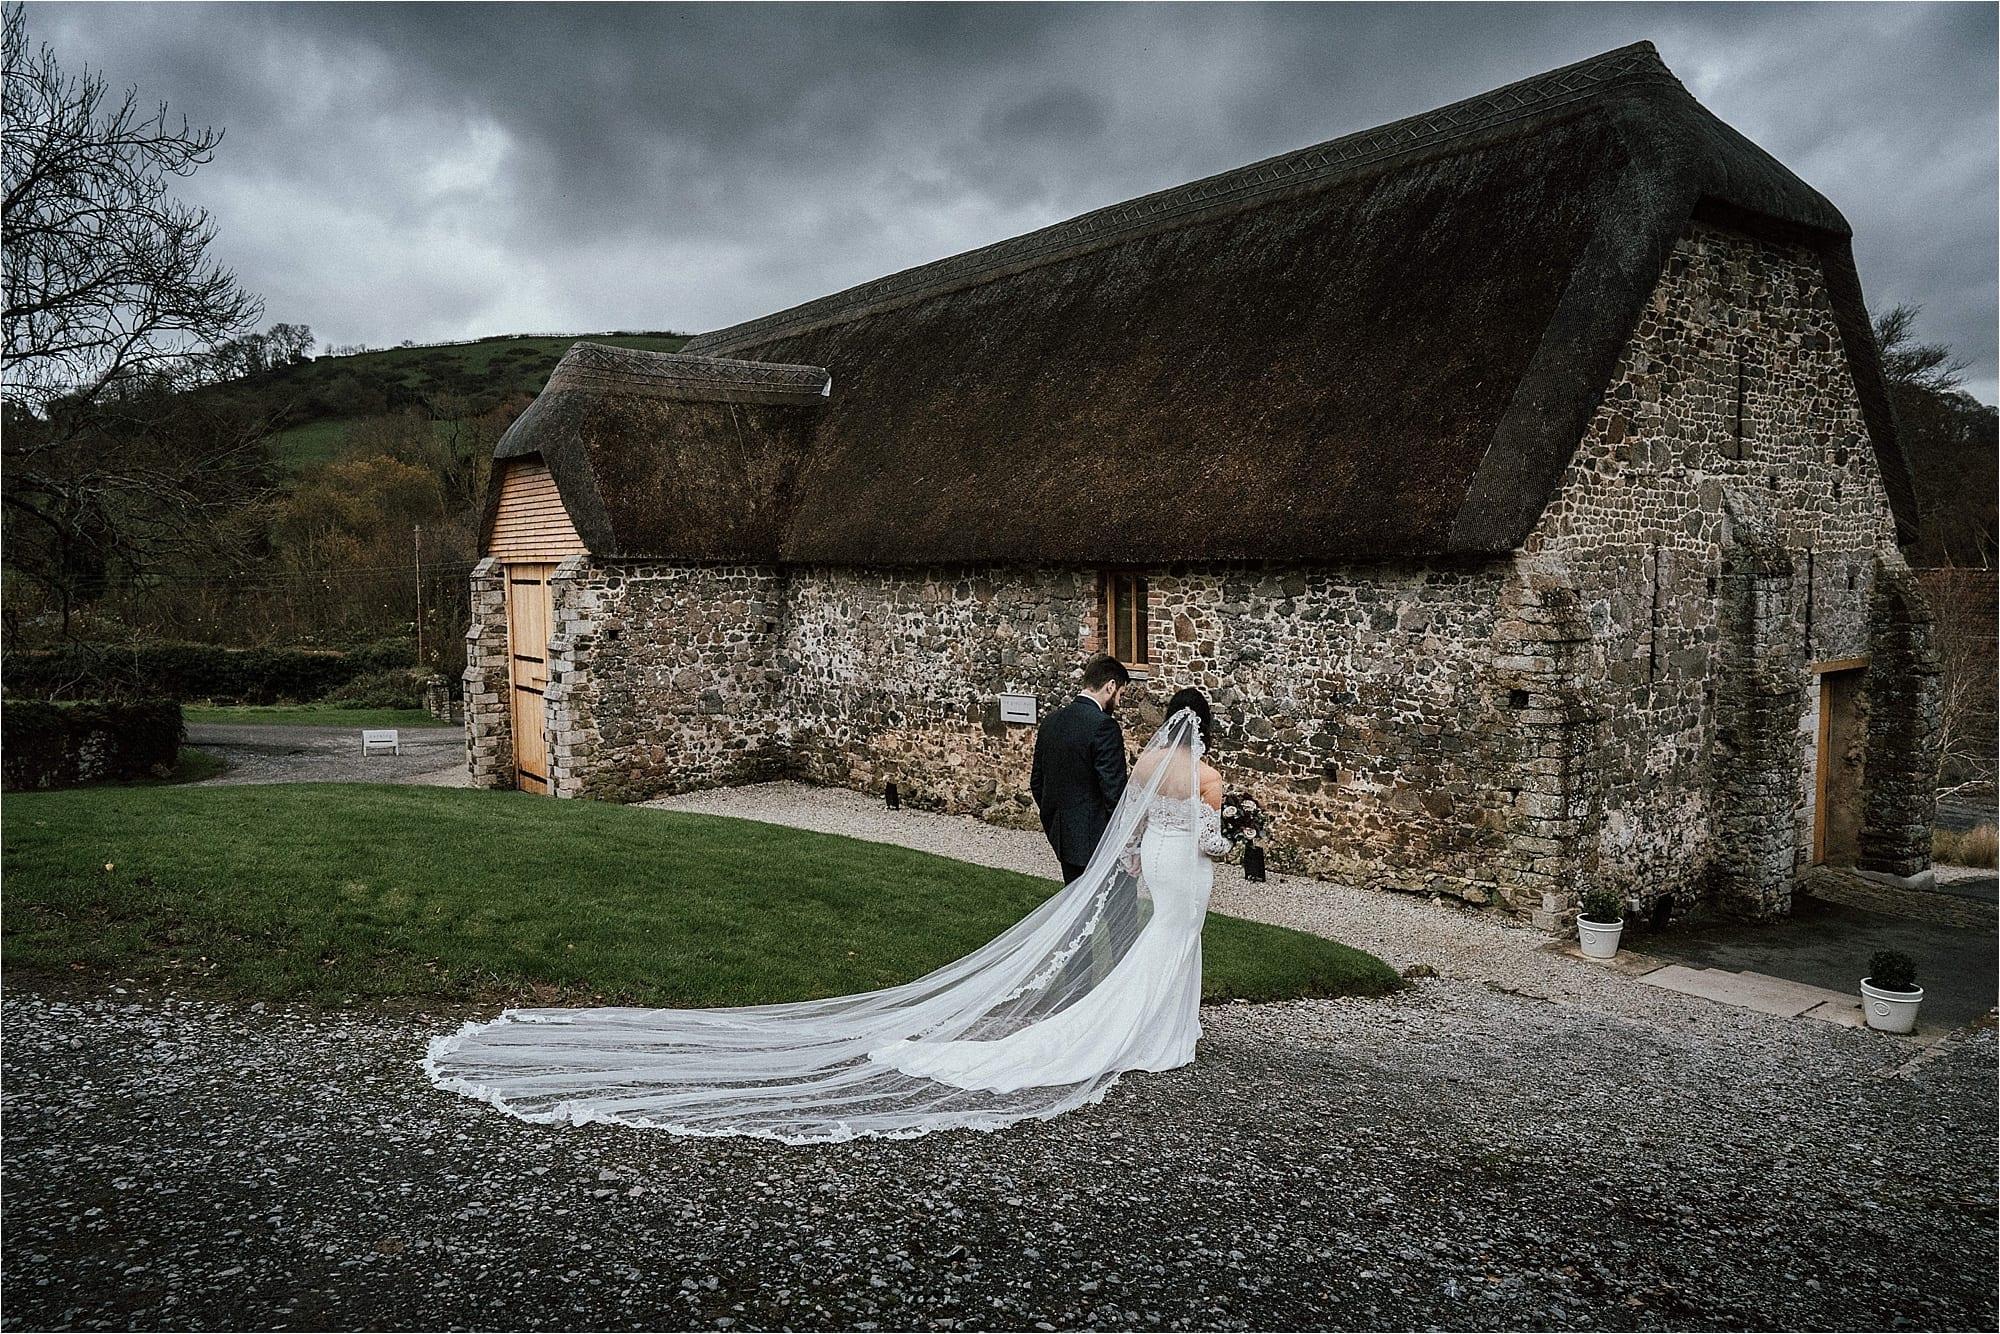 The Great Barn wedding photographer